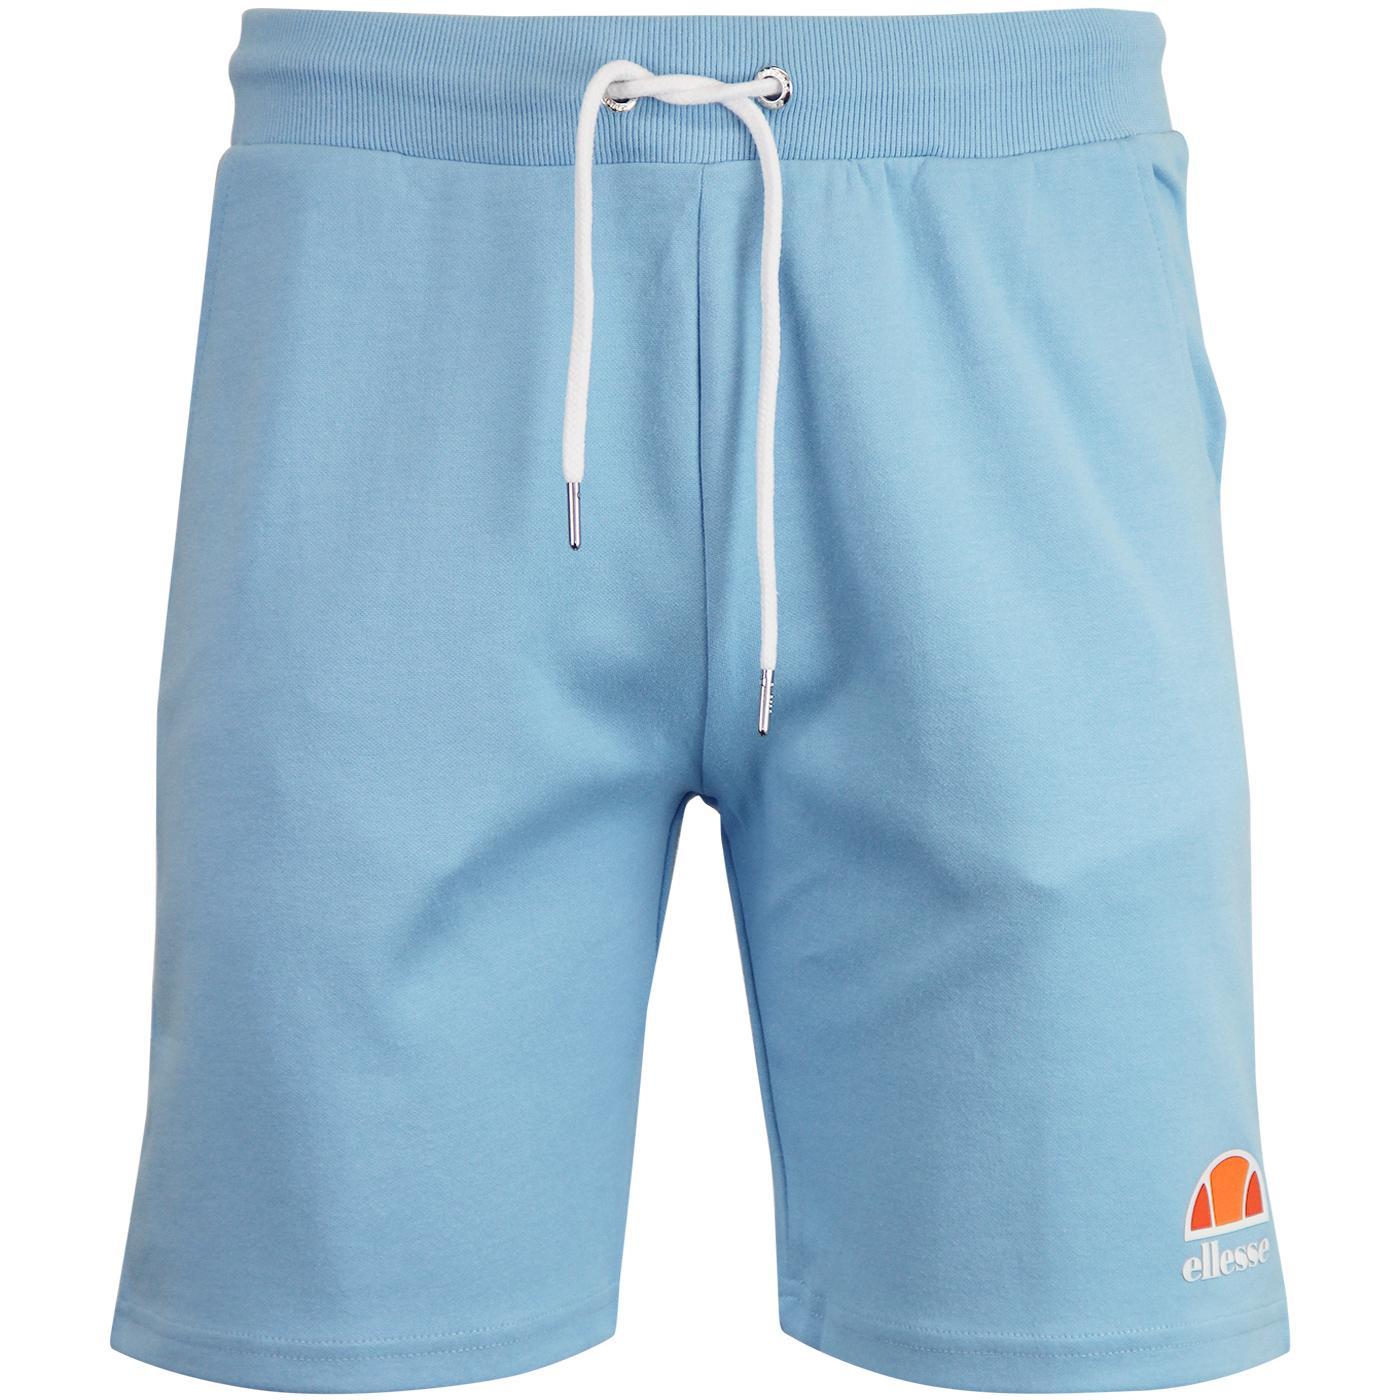 Crawford ELLESSE Retro Men's Jersey Sports Shorts